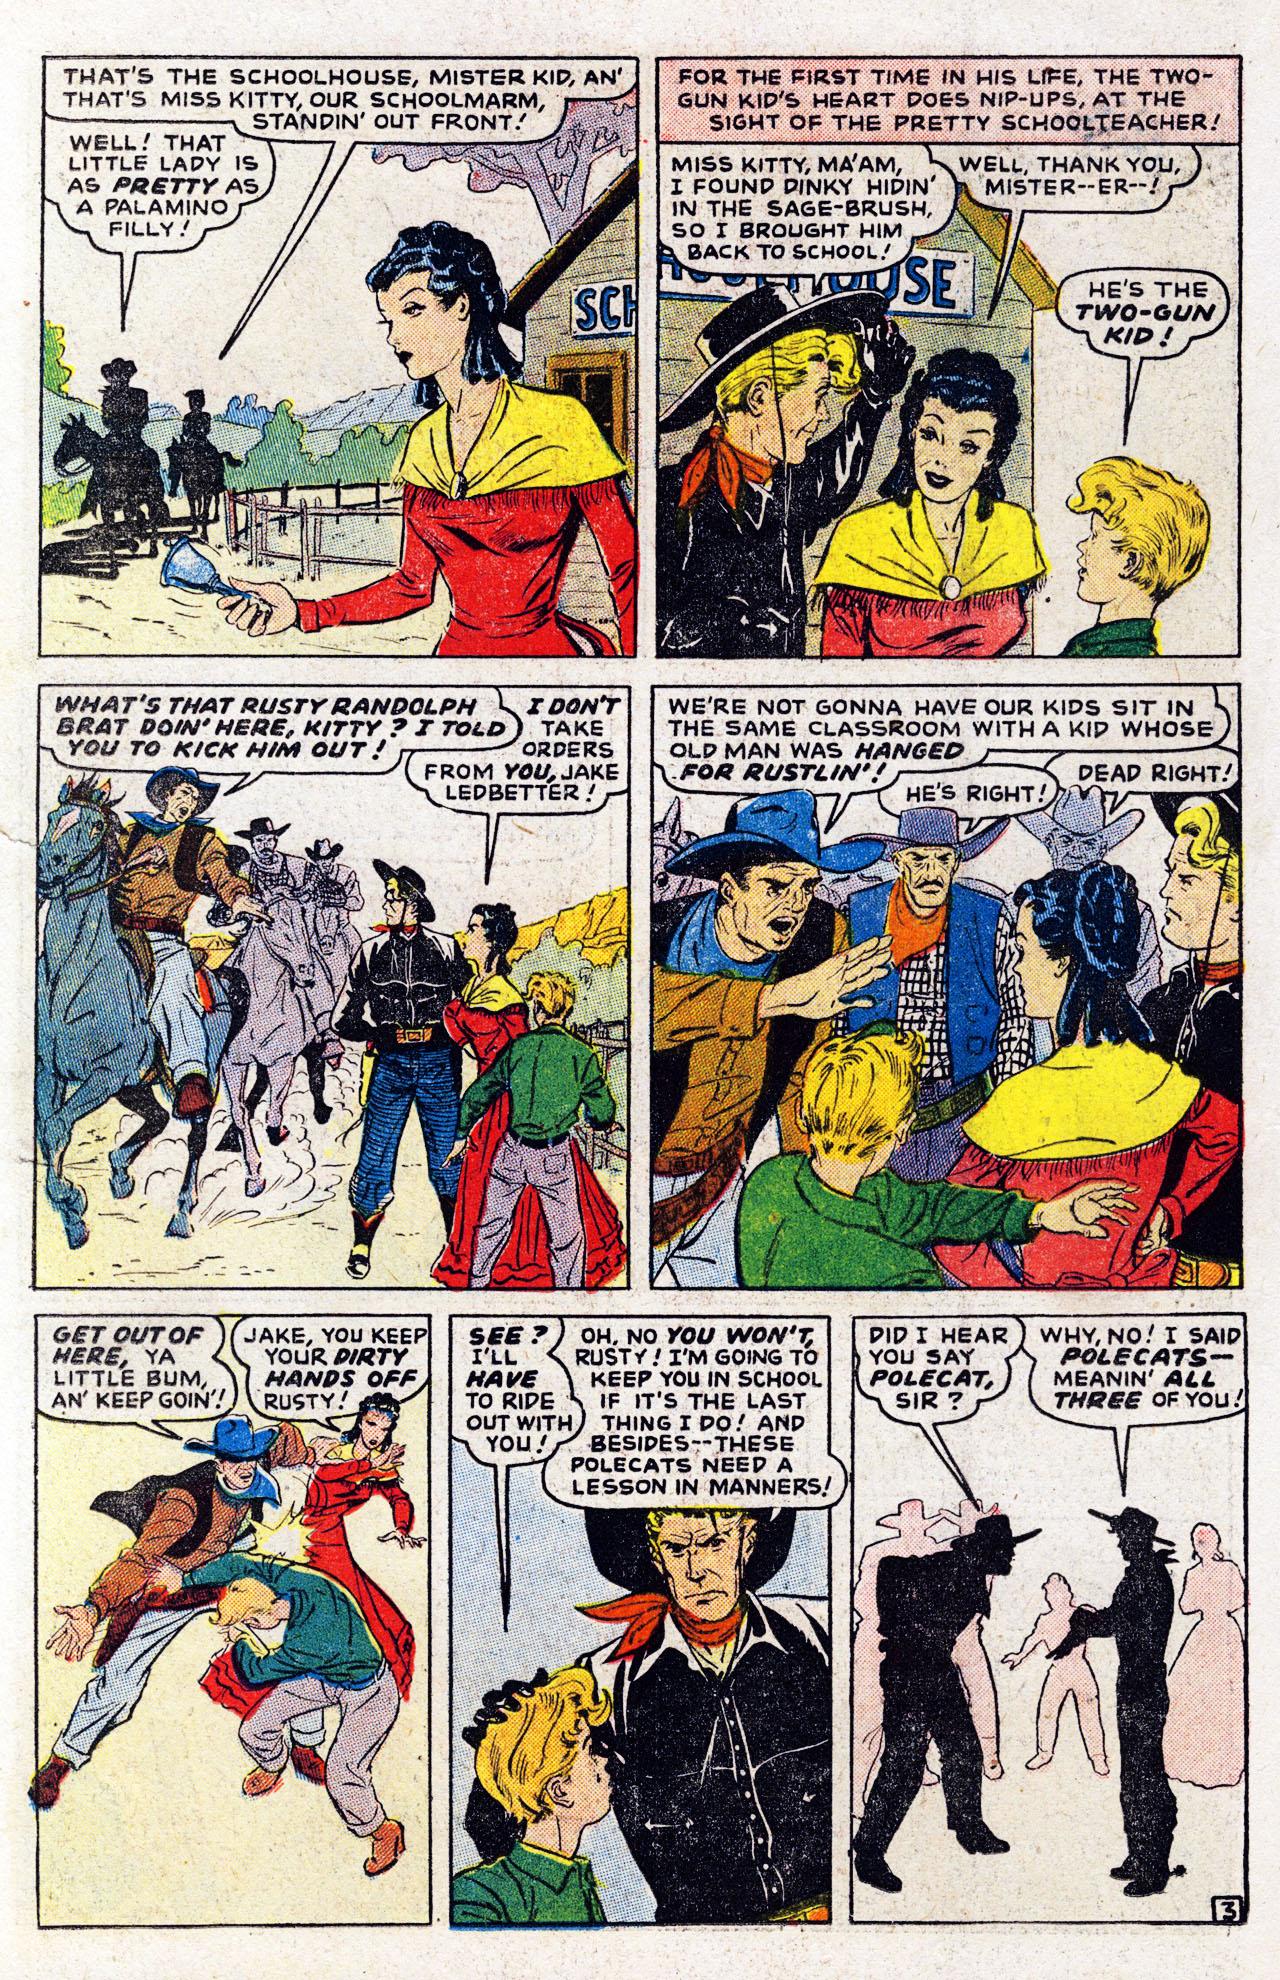 Read online Two-Gun Kid comic -  Issue #7 - 14